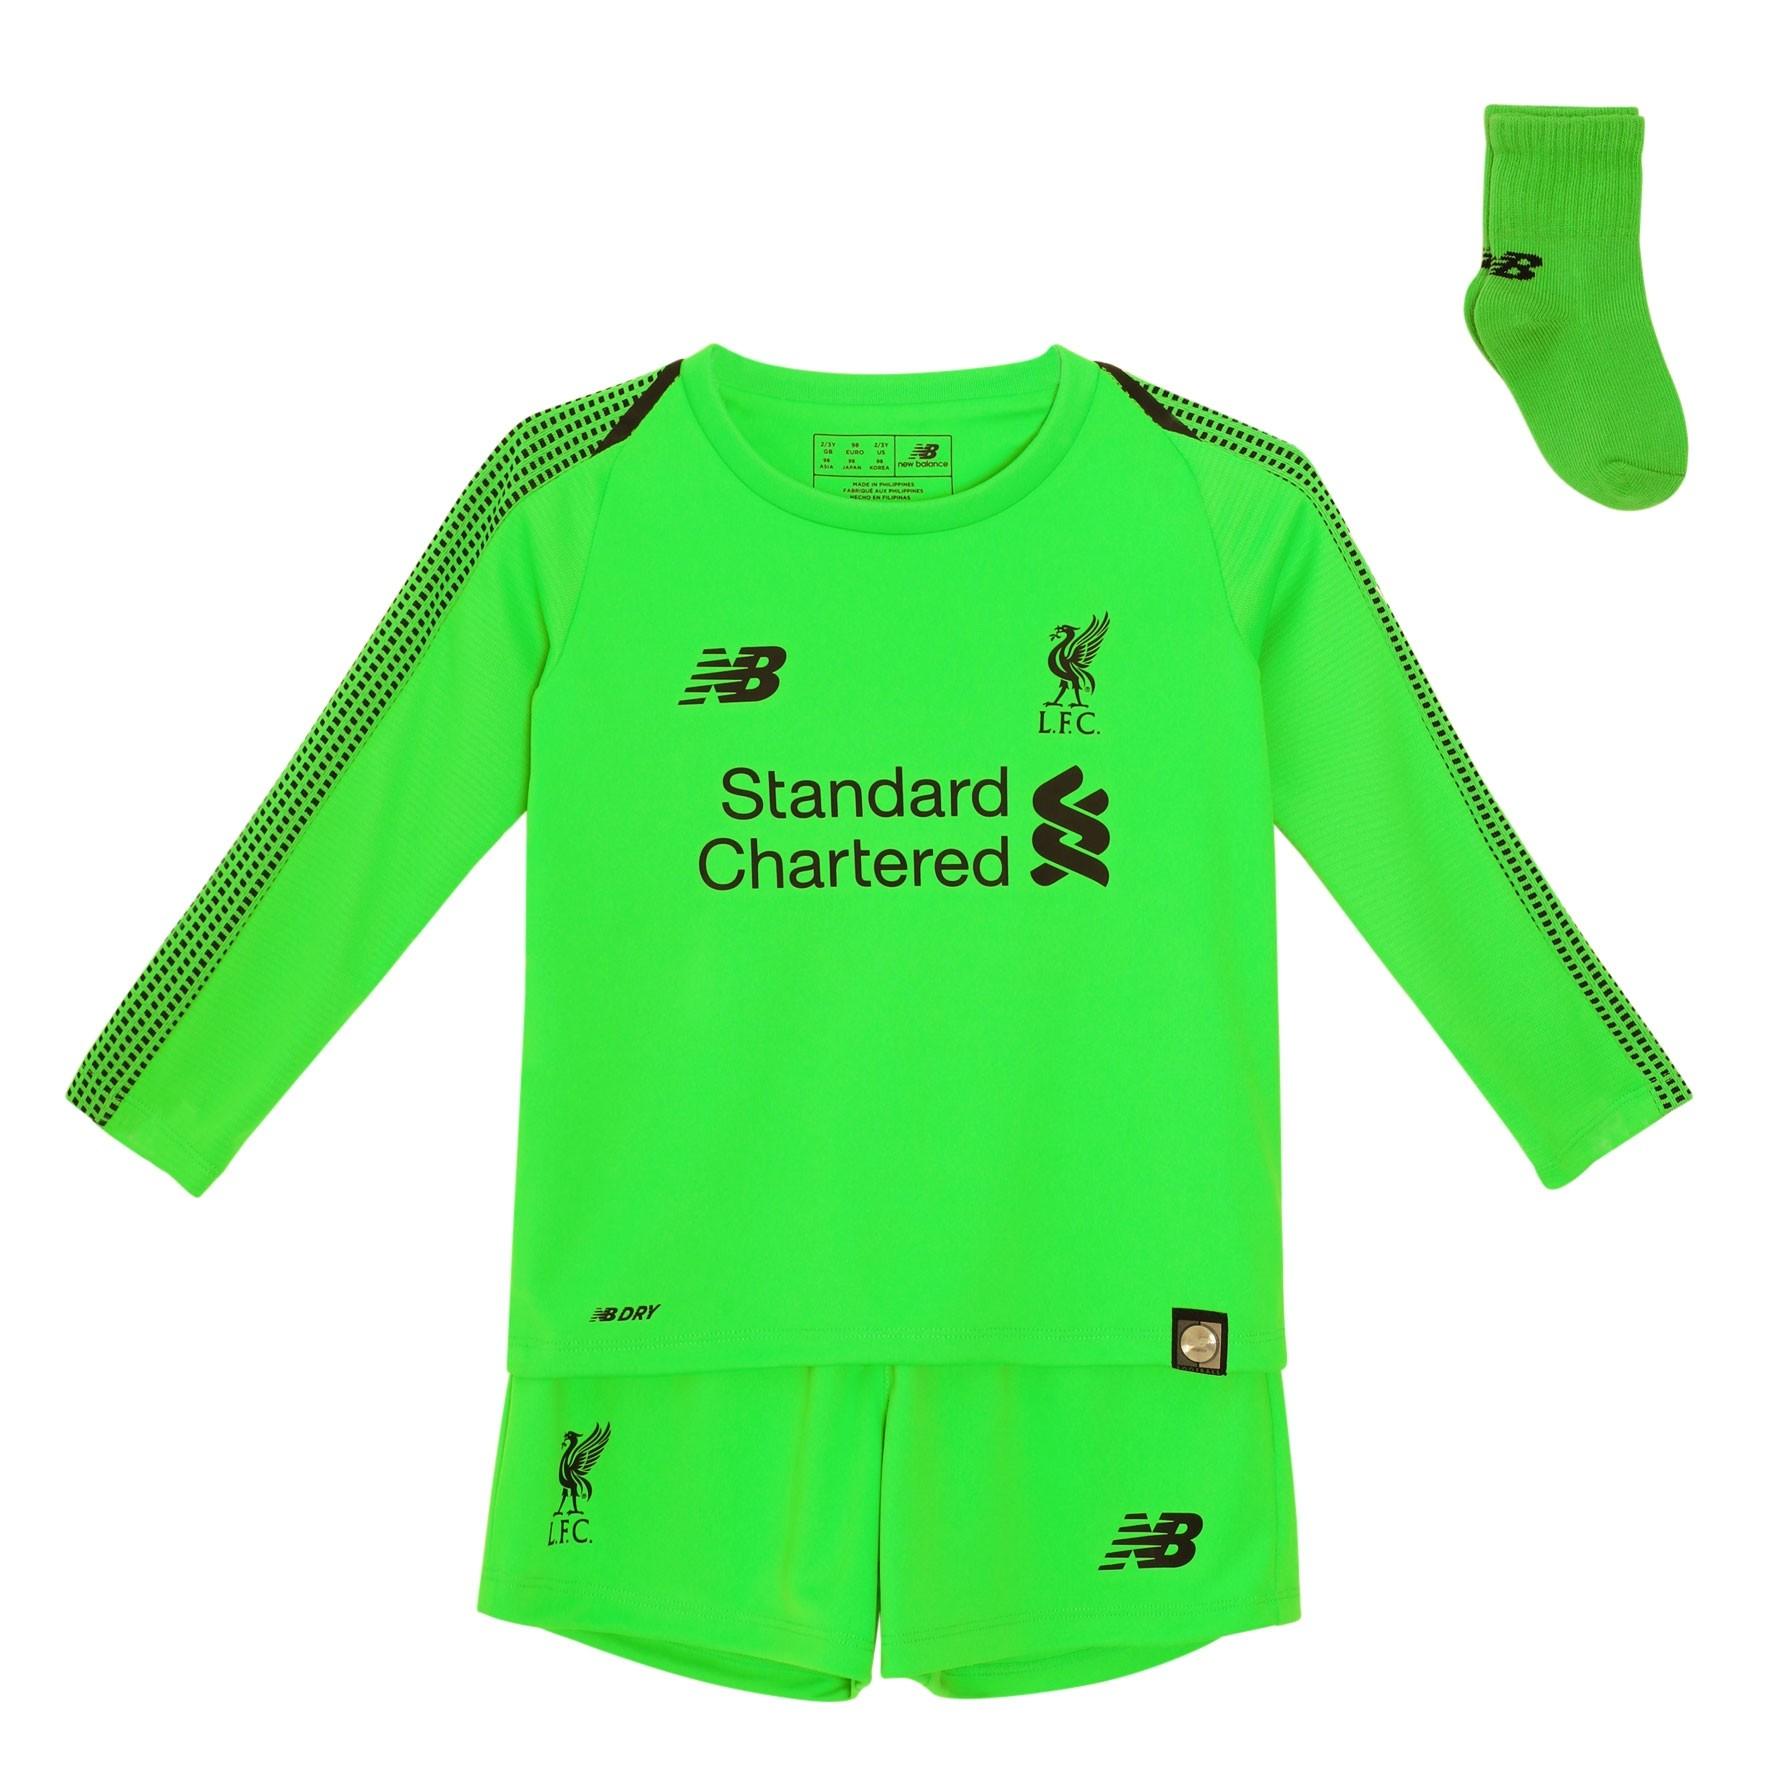 67345f01ddd LFC Baby Goalkeeper Away Kit 18 19